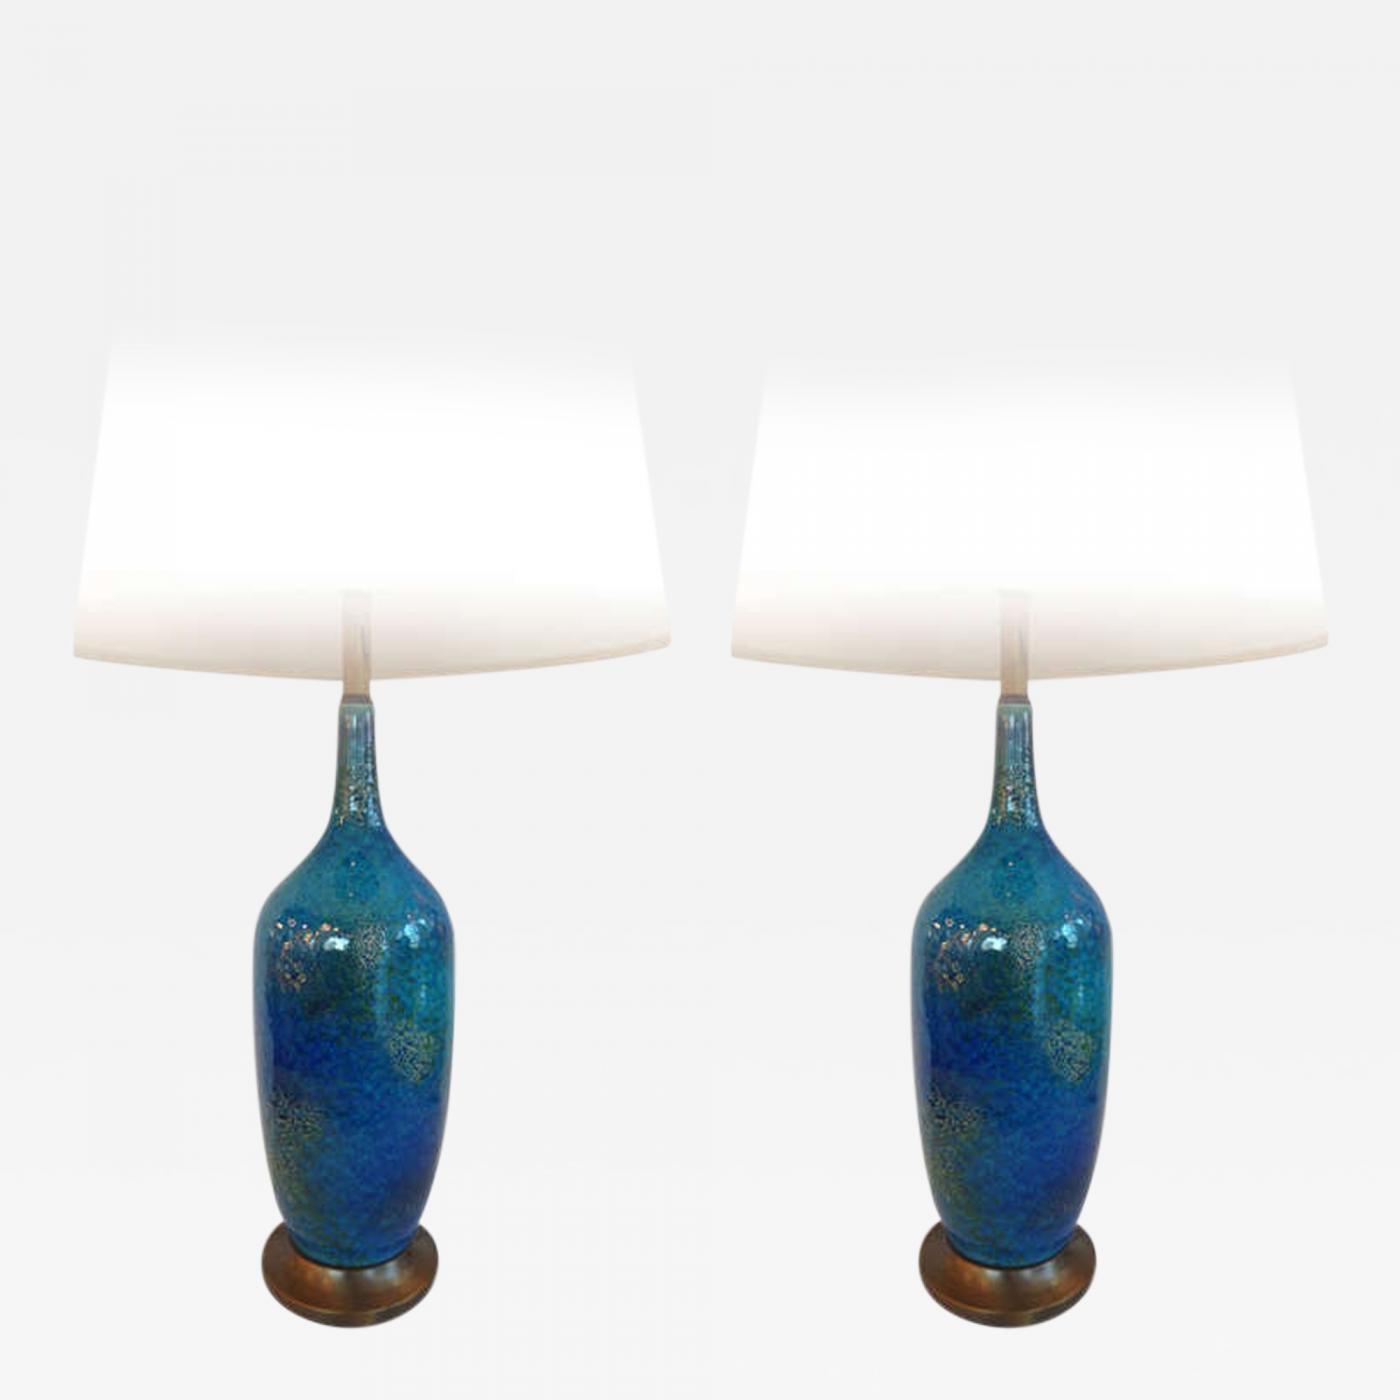 Ceramic Lamps Finest Safavieh Lighting Inch Spring White